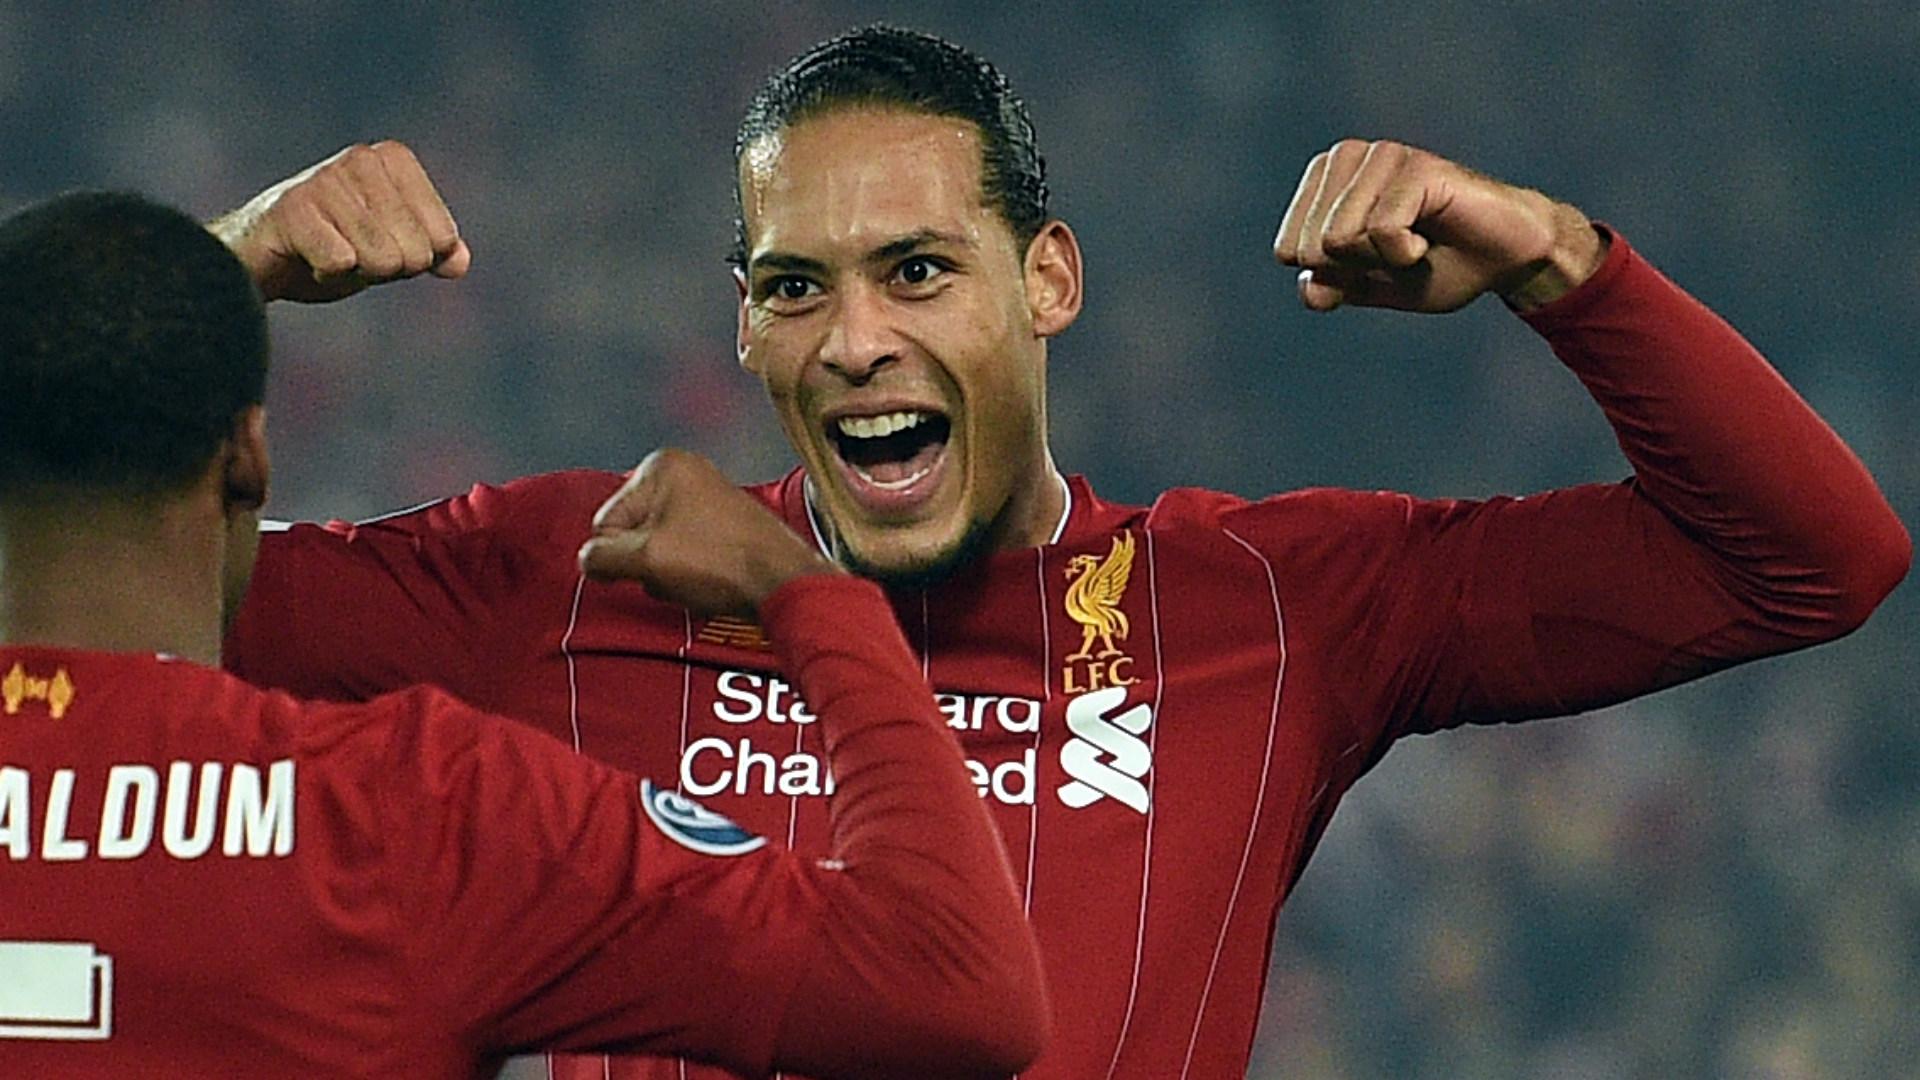 'Van Dijk is perfection & Premier League's best ever' – Liverpool star lauded by Arsenal Invincible